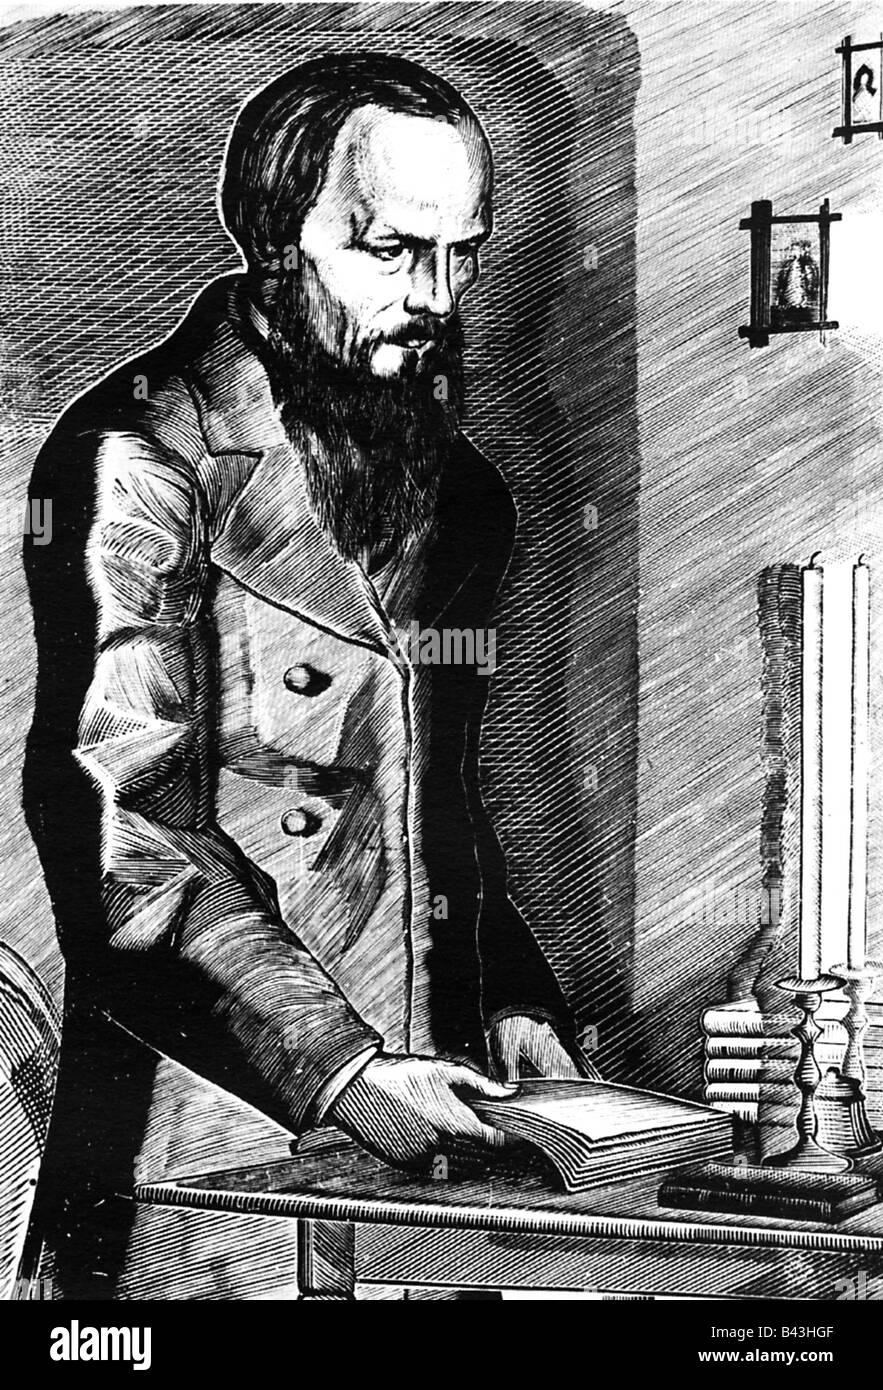 Dostoevsky, Fyodor Mikhailovich, 11.11.1821 - 9.2.1881, Russian writer, novelist, half length, historical picture, - Stock Image